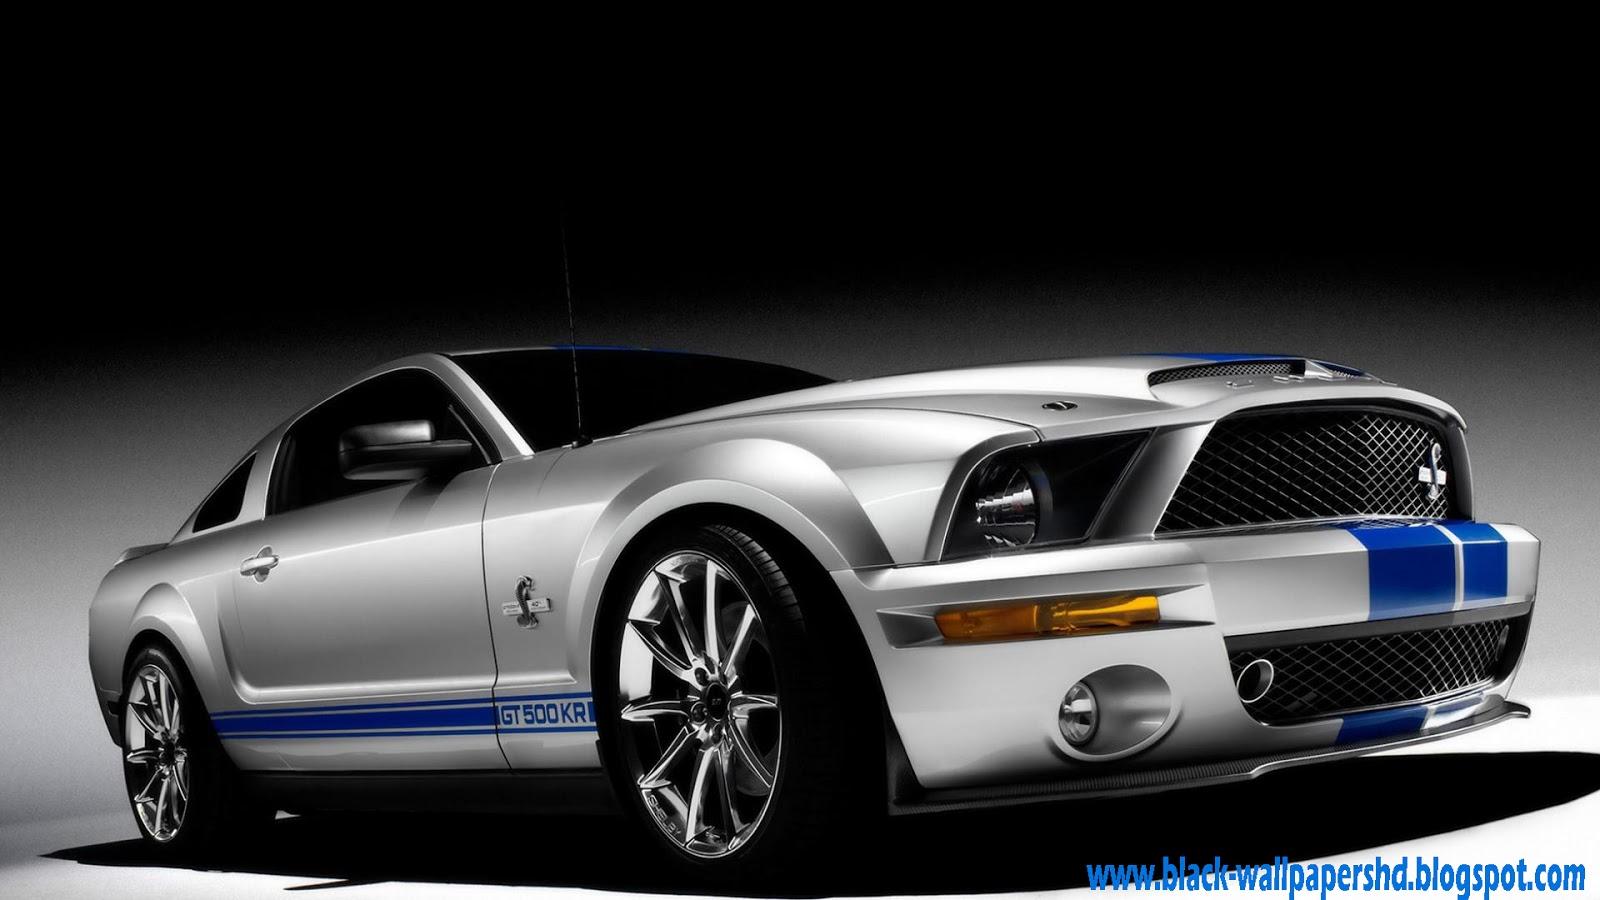 Top 10 Best Car Wallpapers HD   Black Wallpapers HD Part 1 1600x900